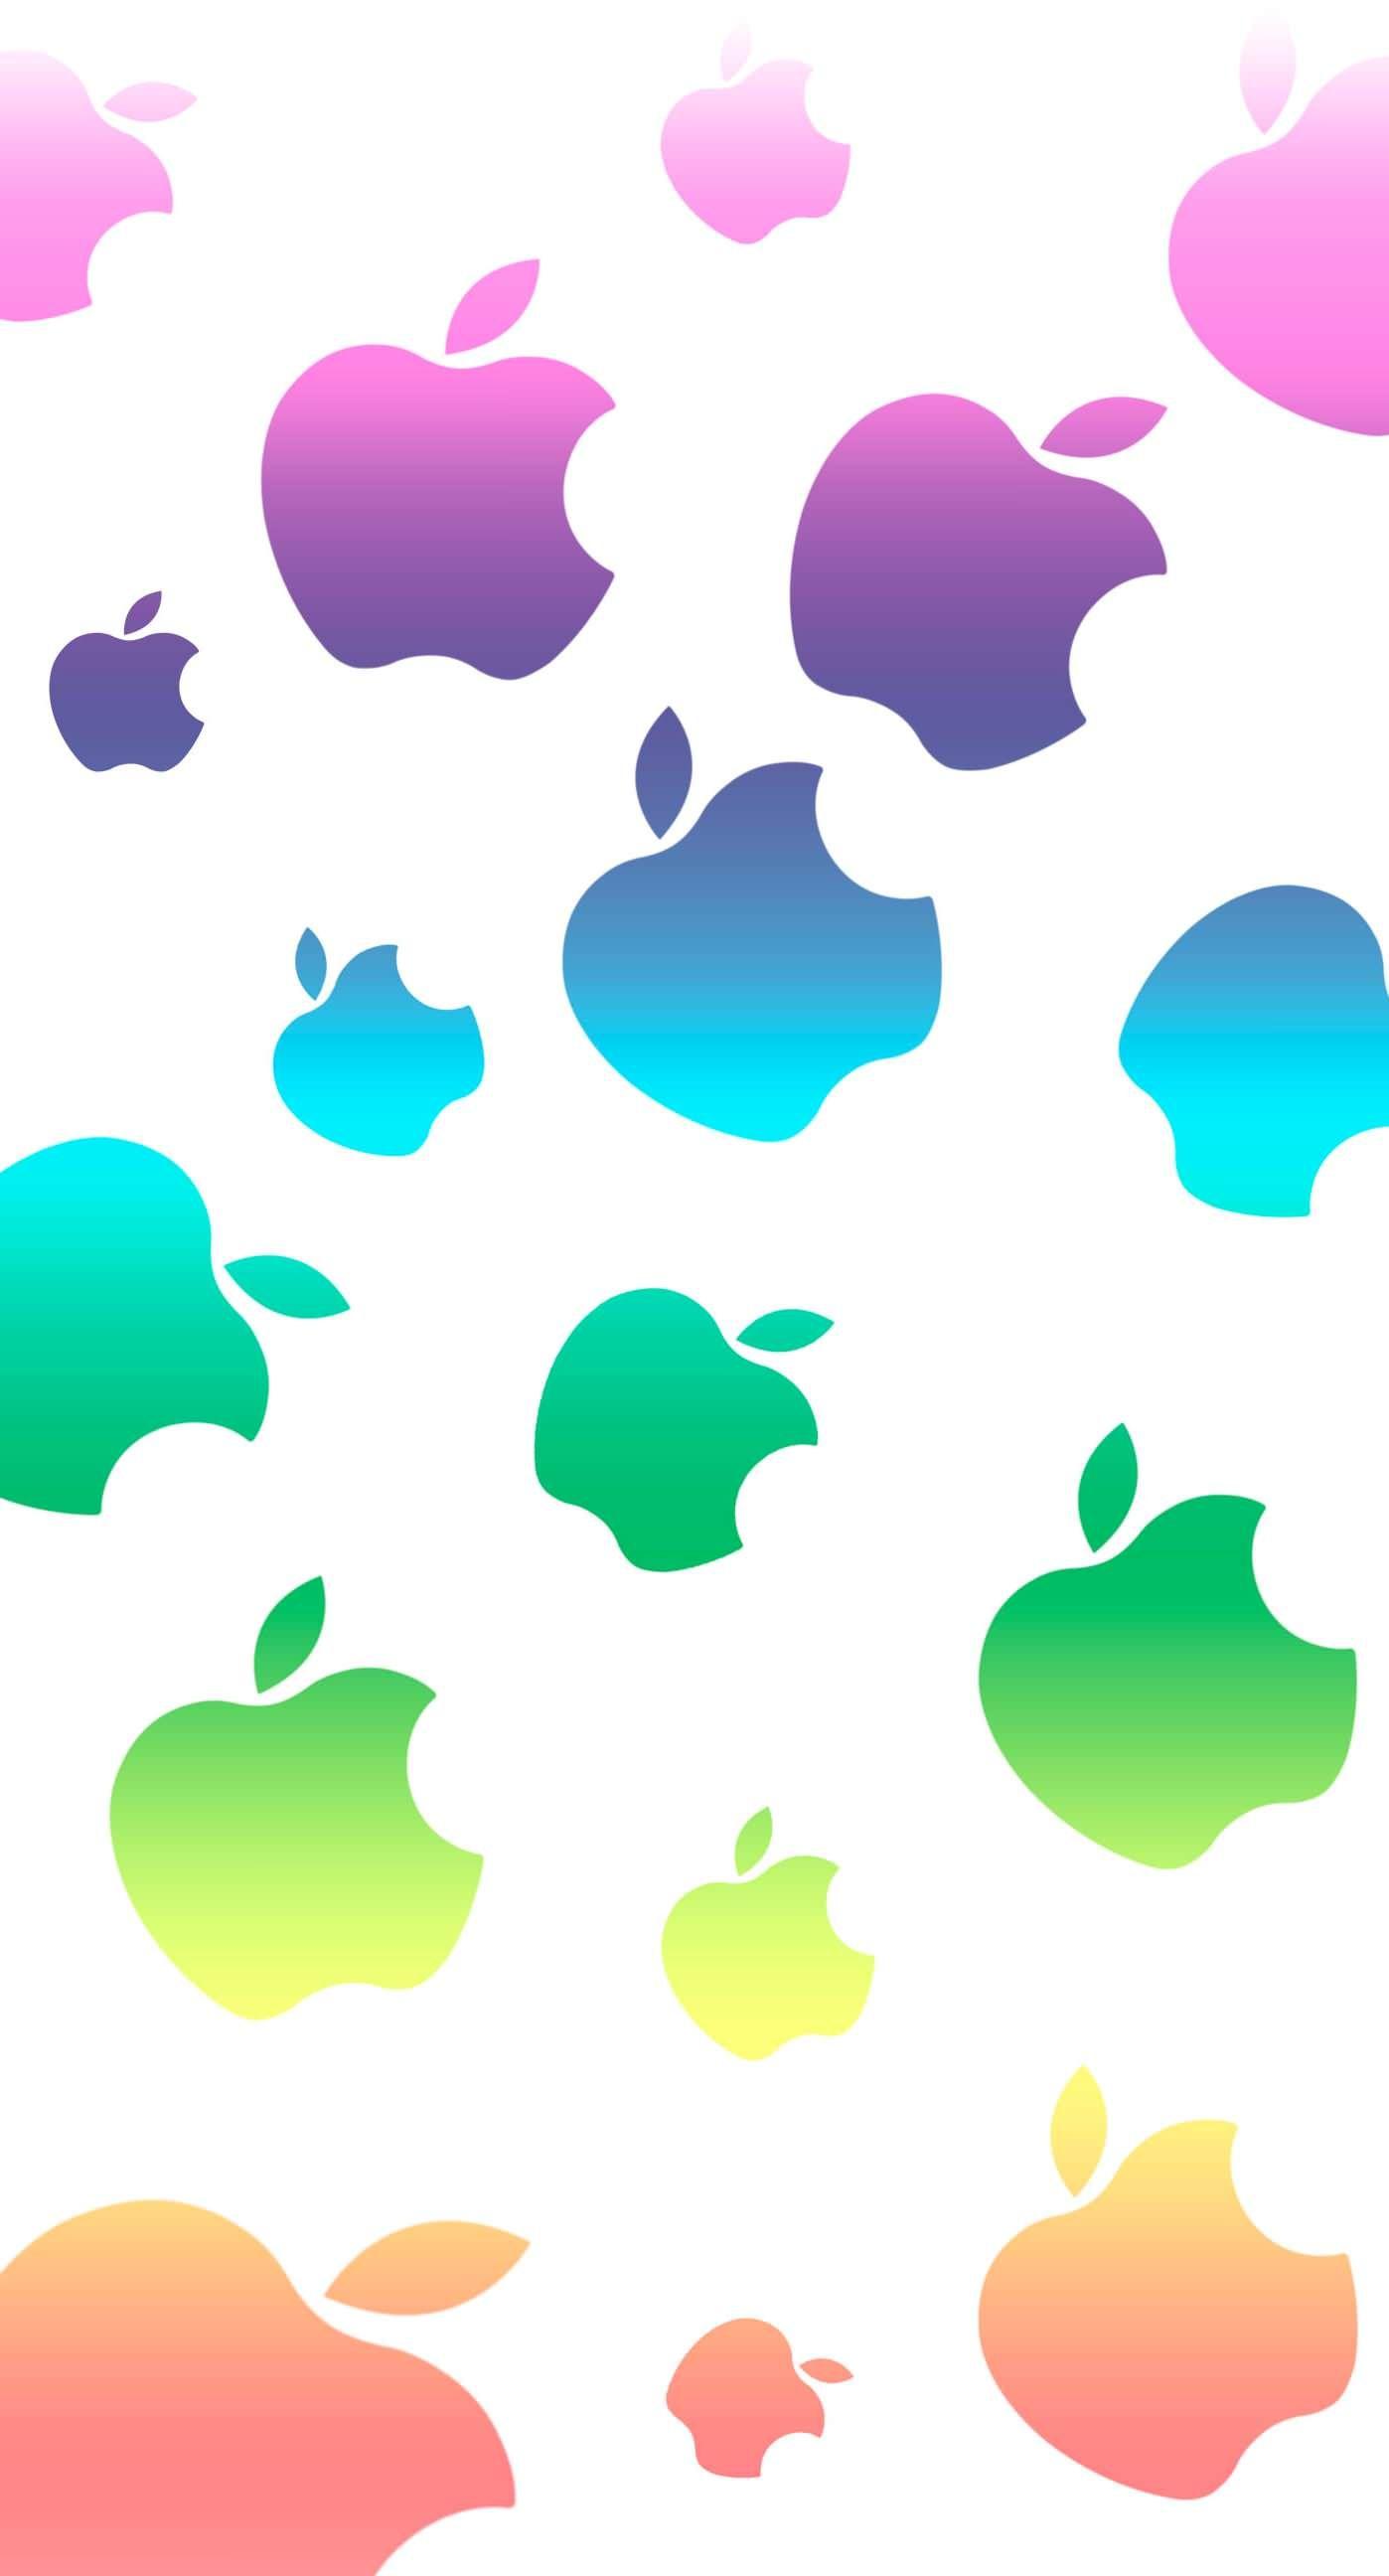 Pin By Yuli Arif On Iphone 6 Apple Logo Wallpaper Iphone Wallpaper Iphone Cute Apple Wallpaper